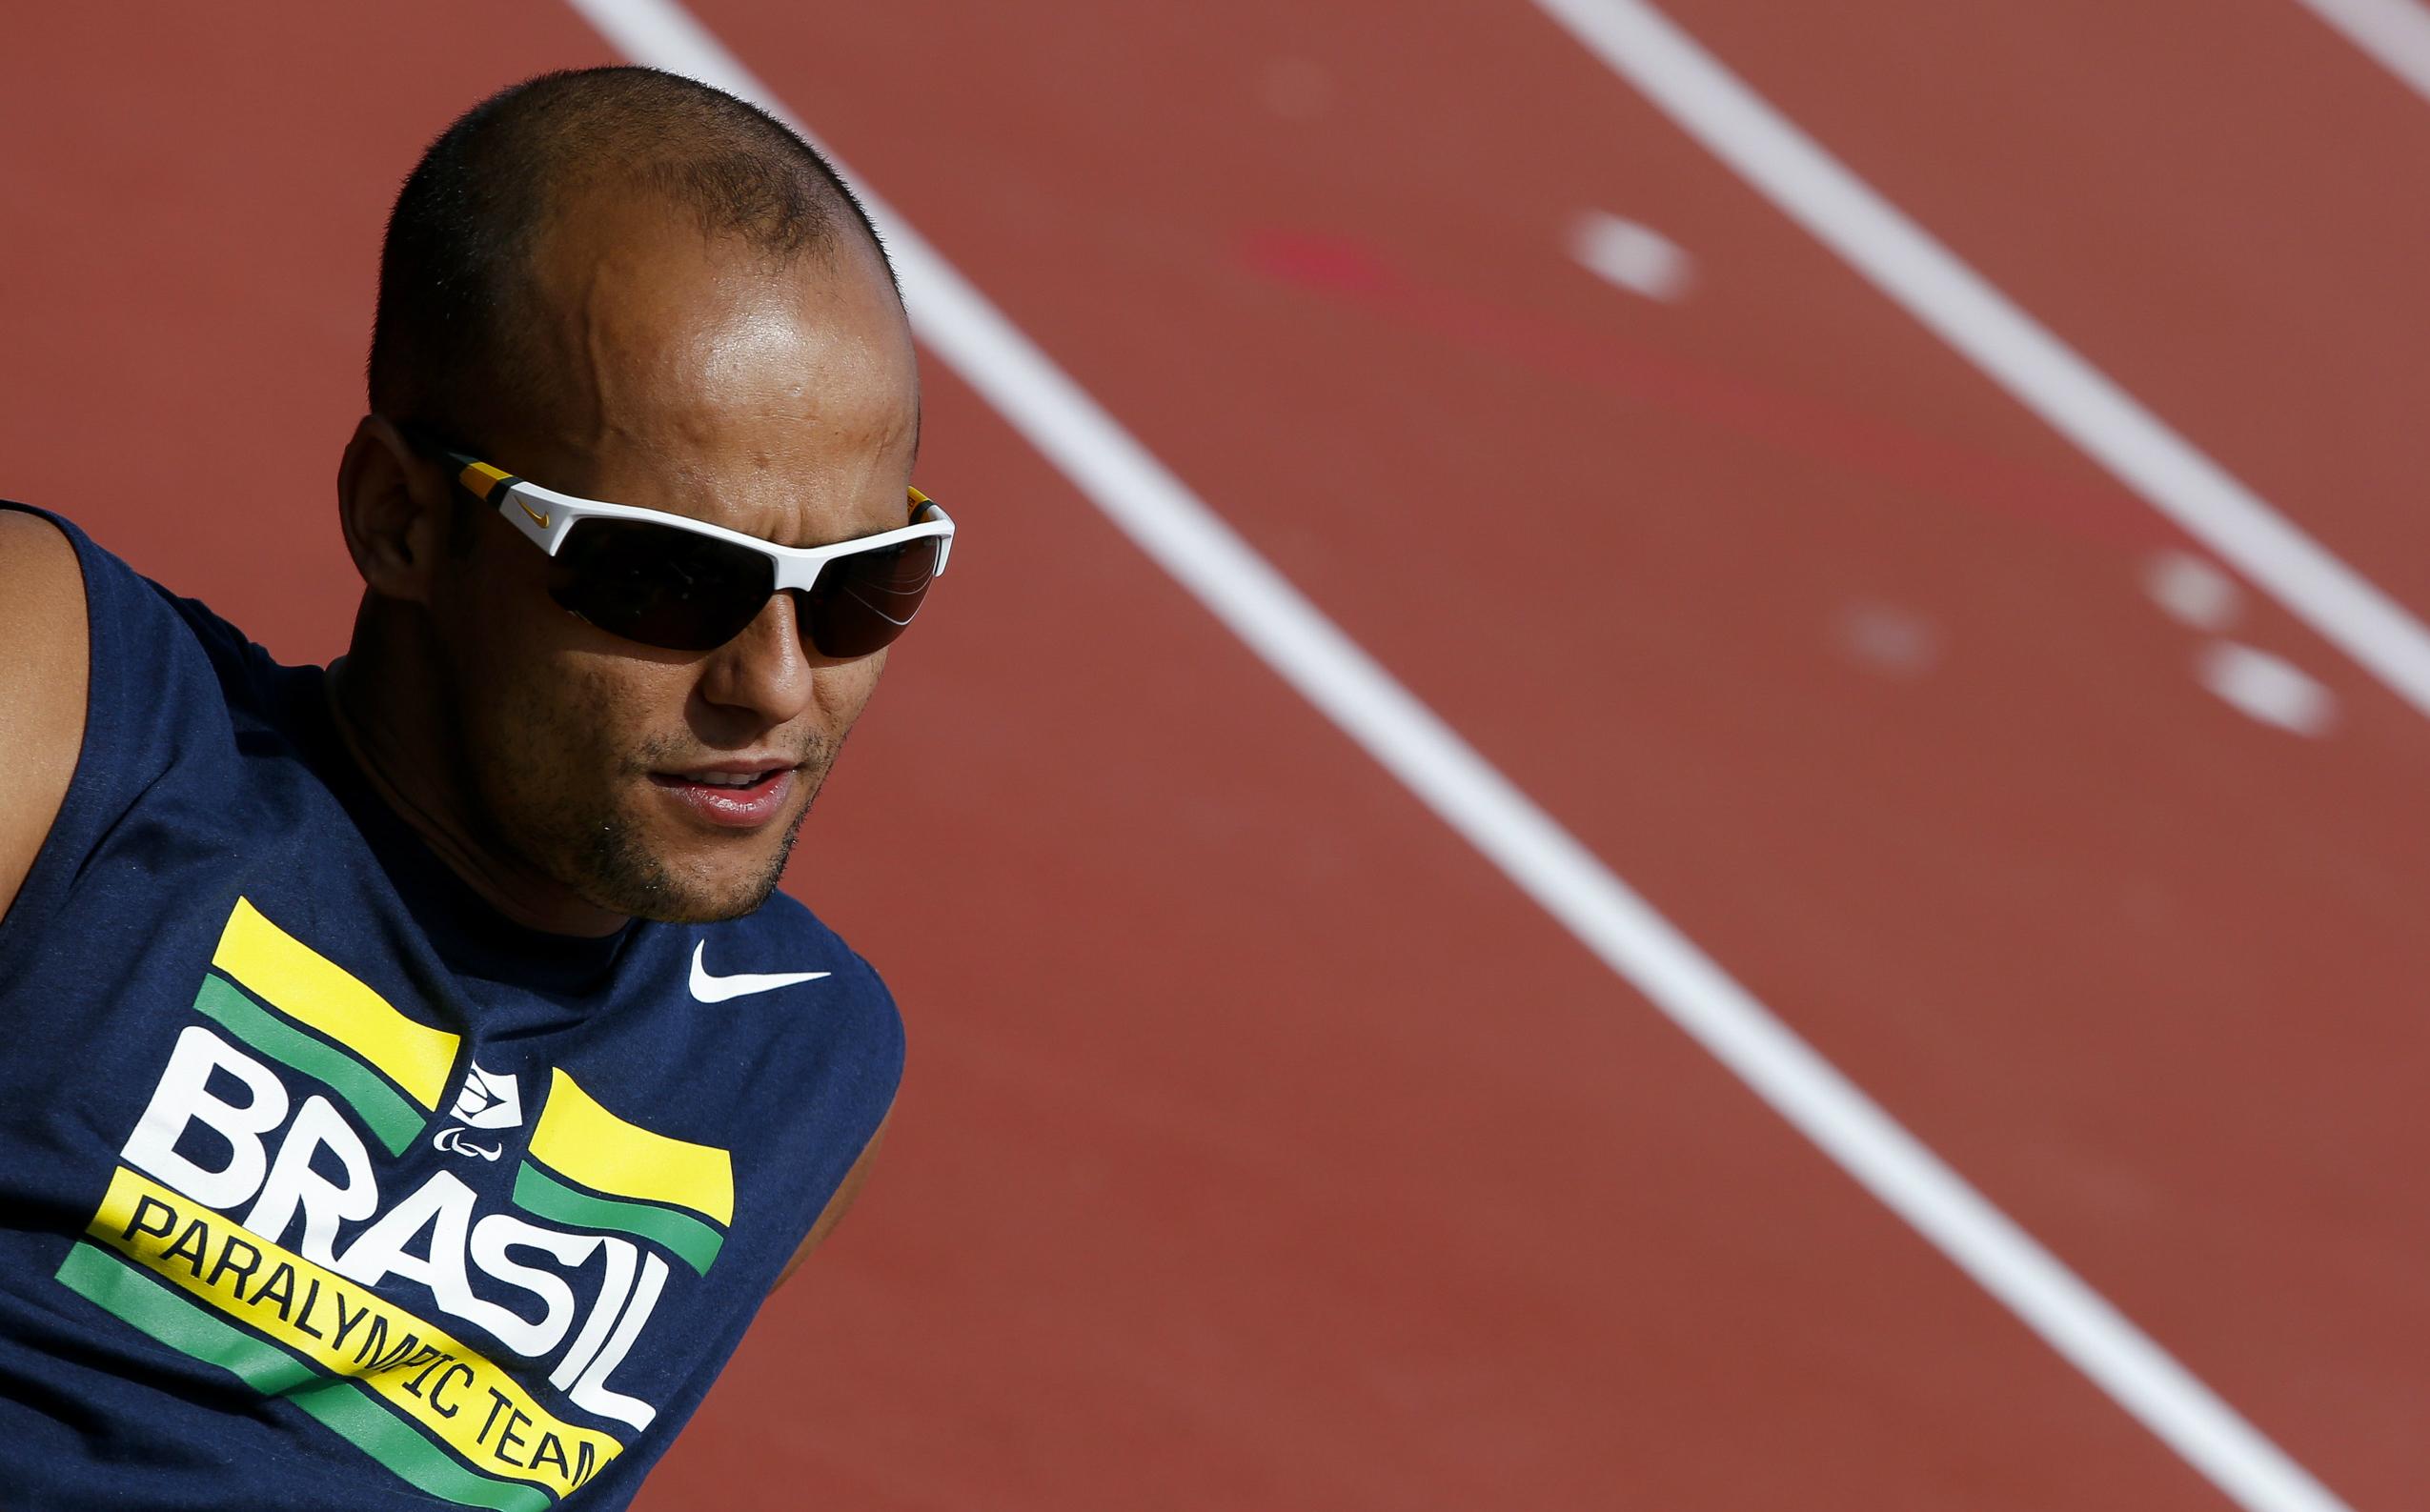 Lucas Prado velocista paraolímpico brasileiro